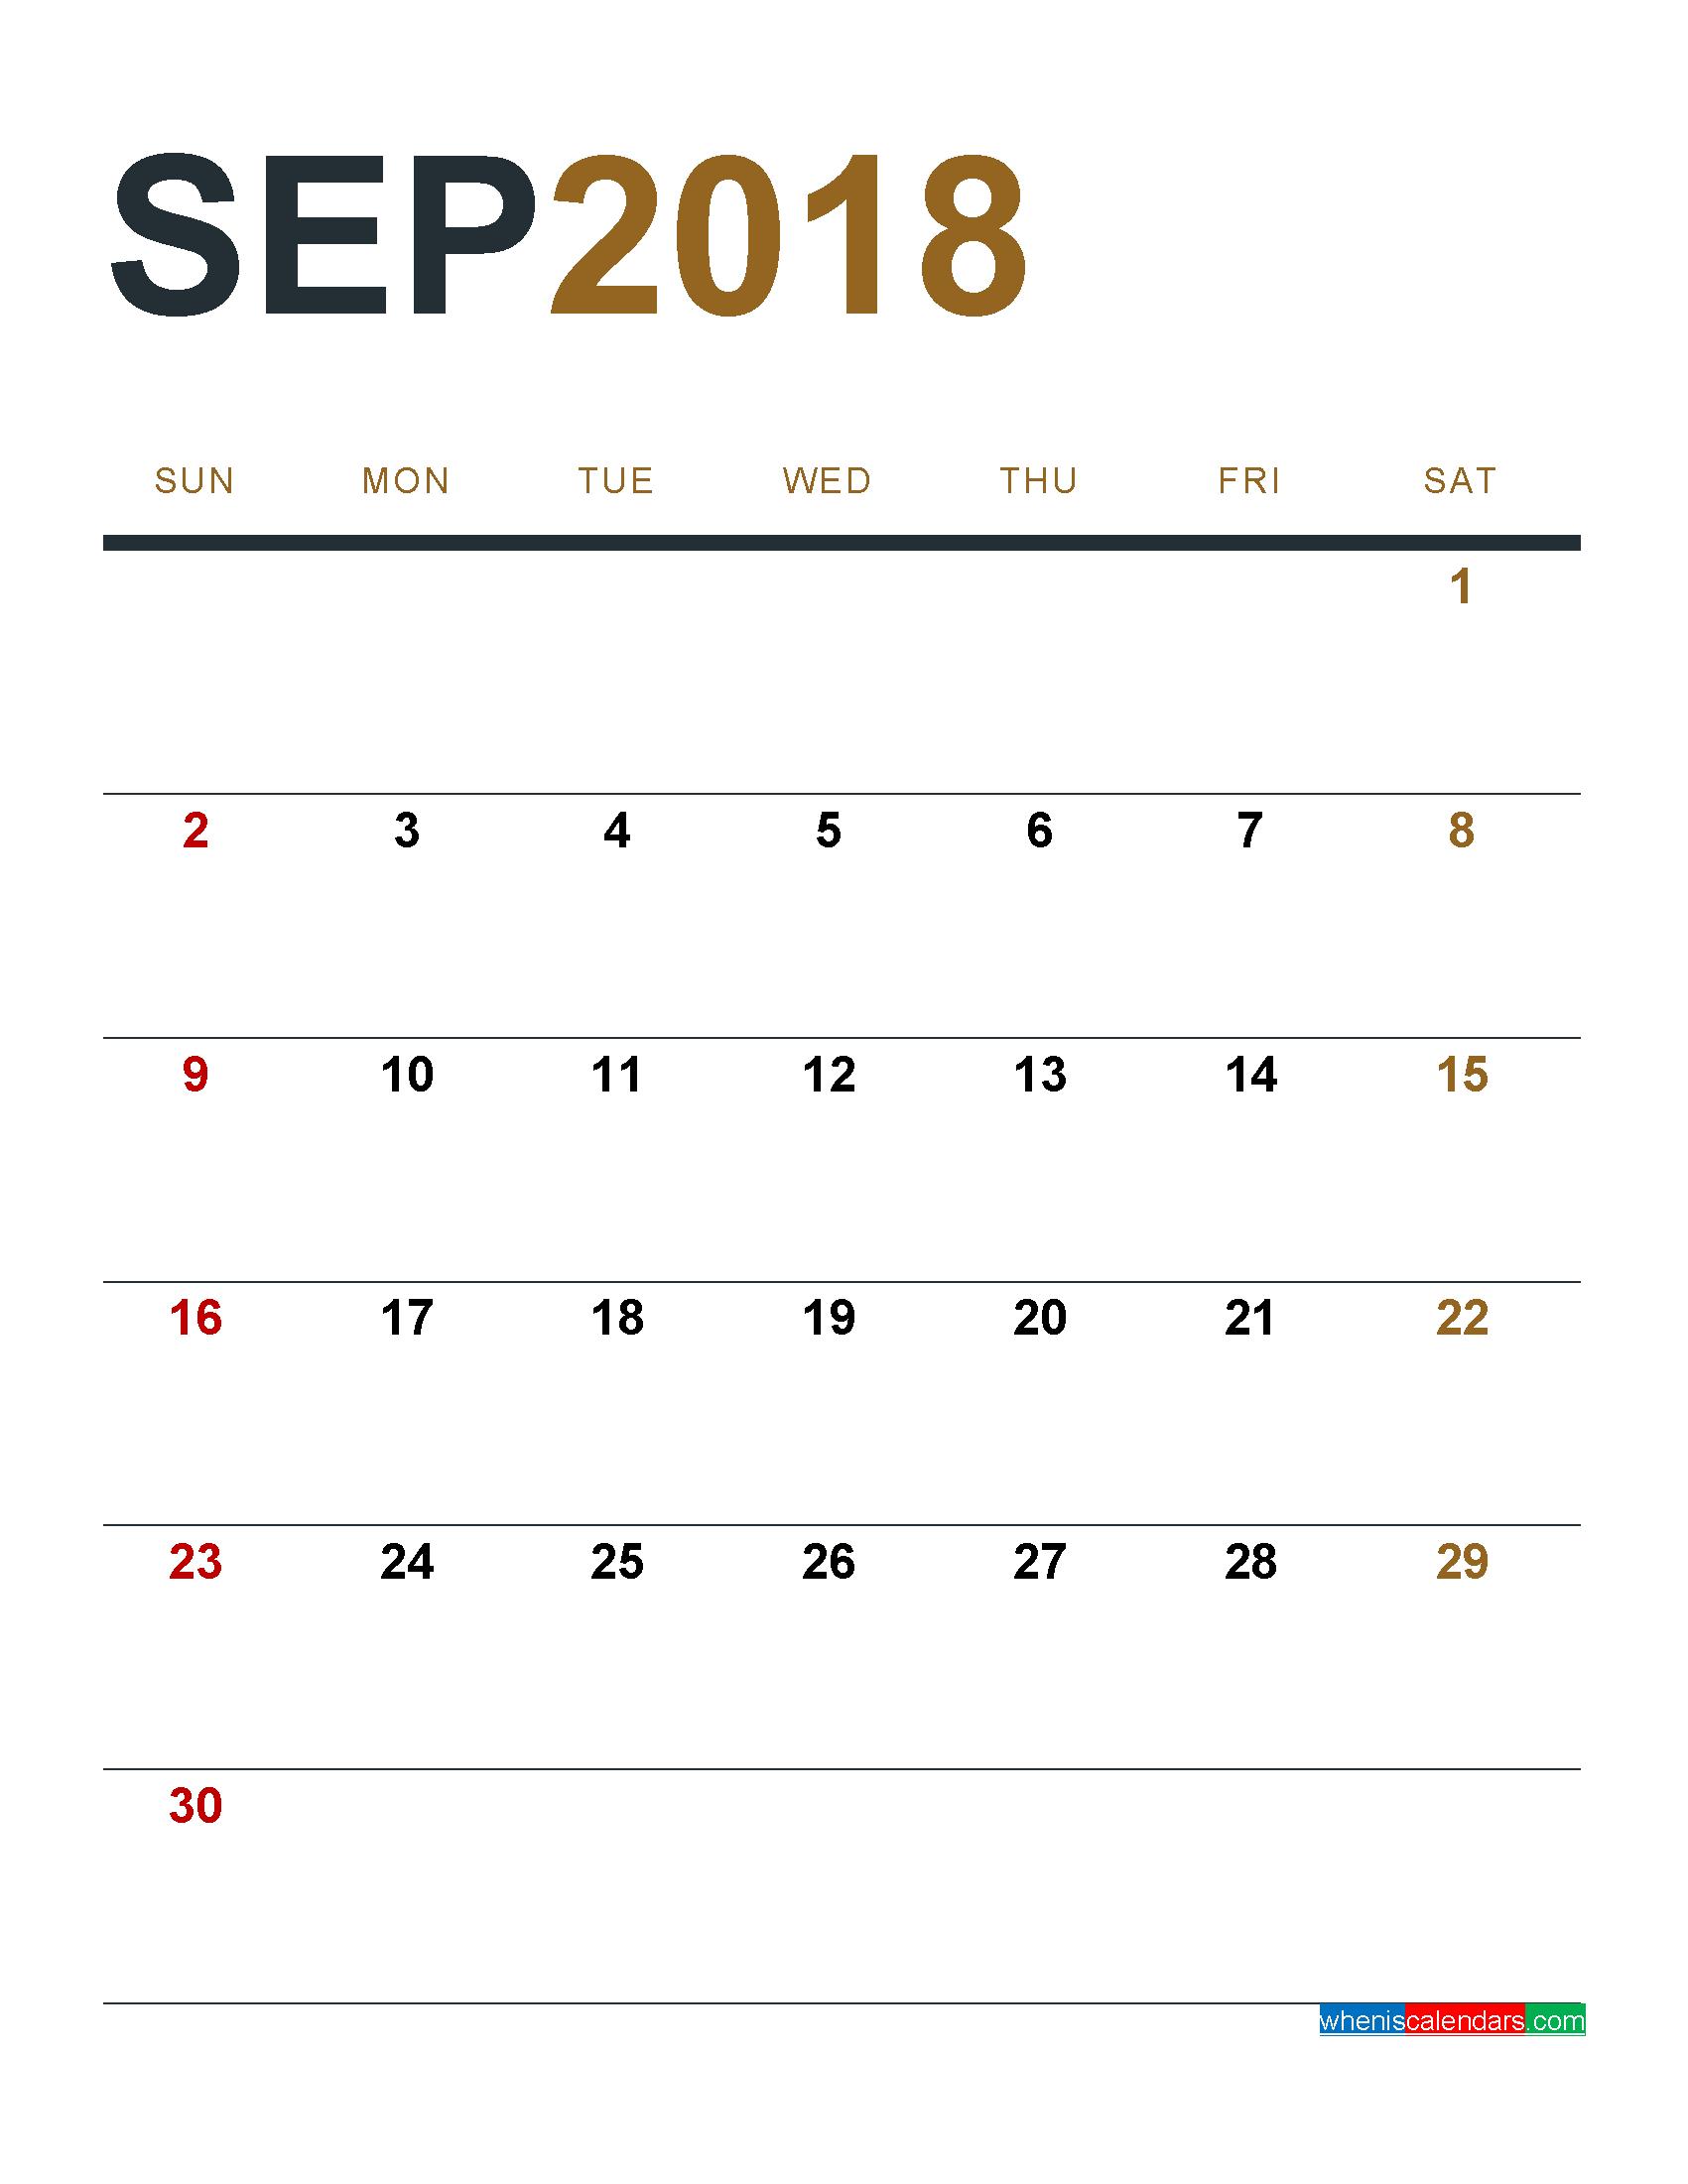 September 2018 Calendar Printable as PDF and Image 1 Month 1